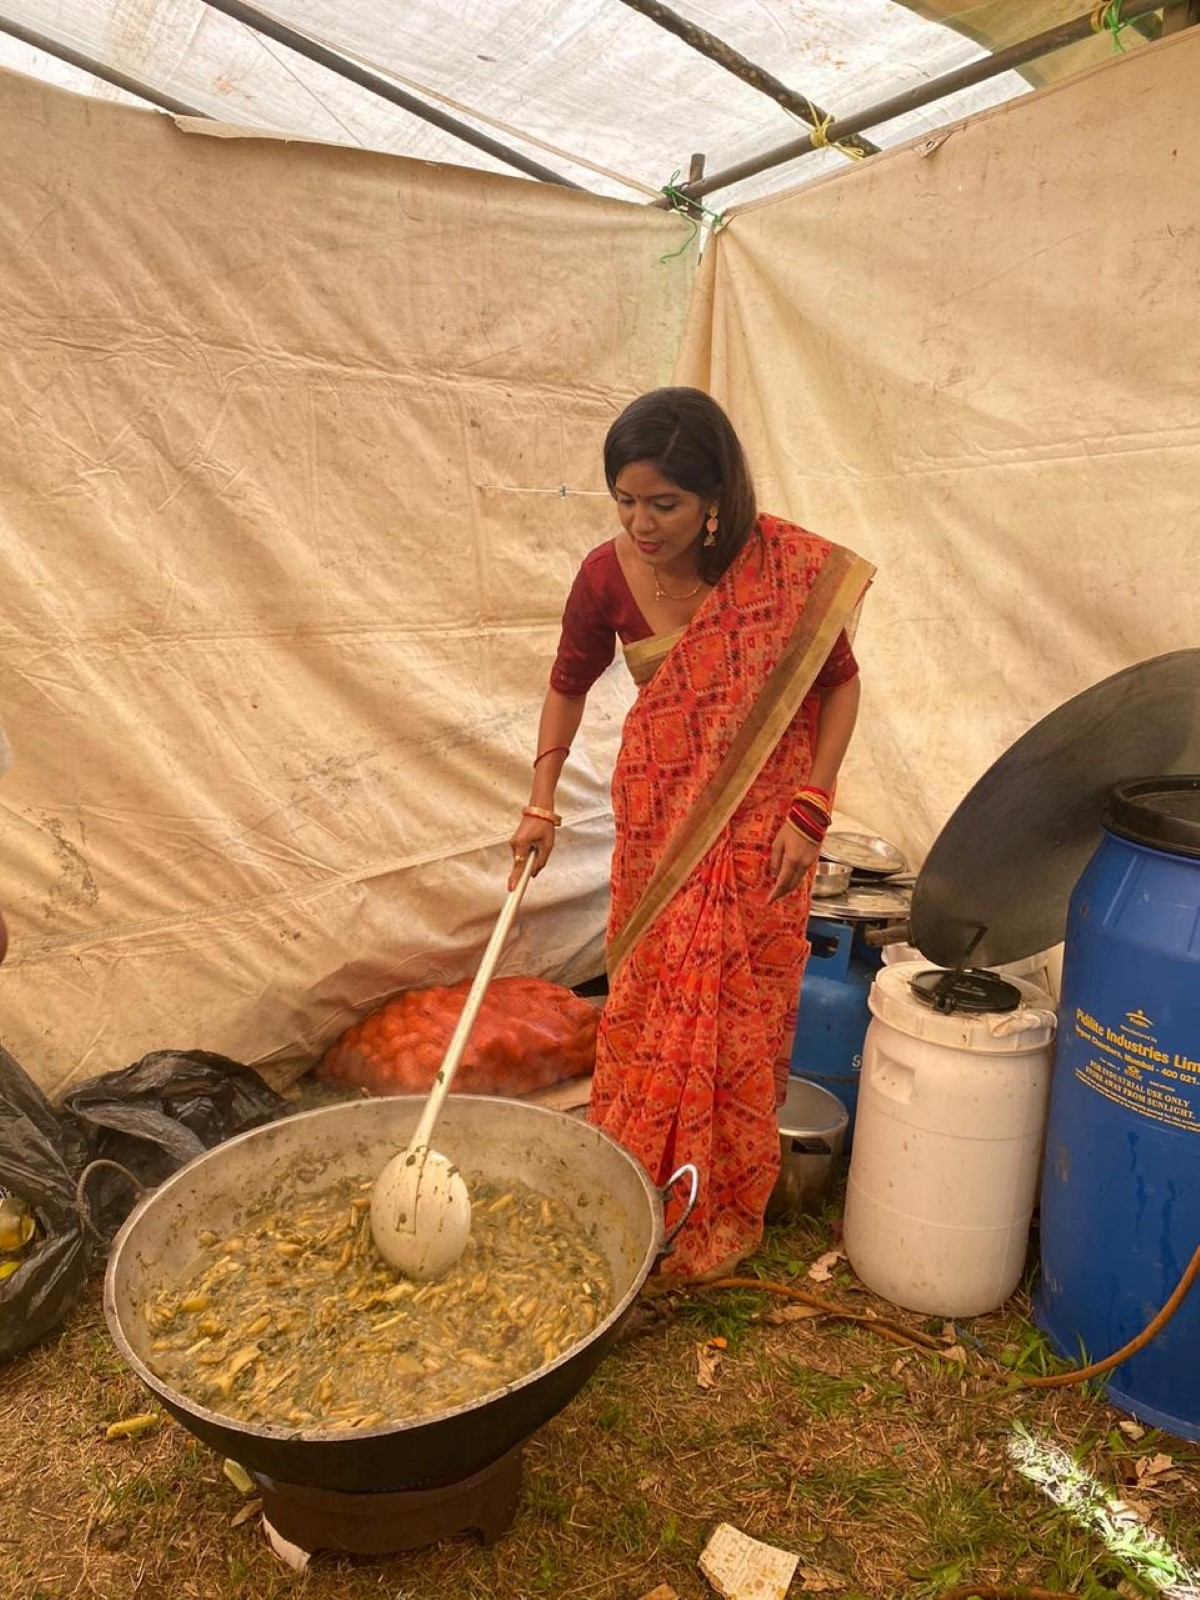 Subashnee Mahadao Lutchmun Roy en apprenti cuistot à Grand Bassin